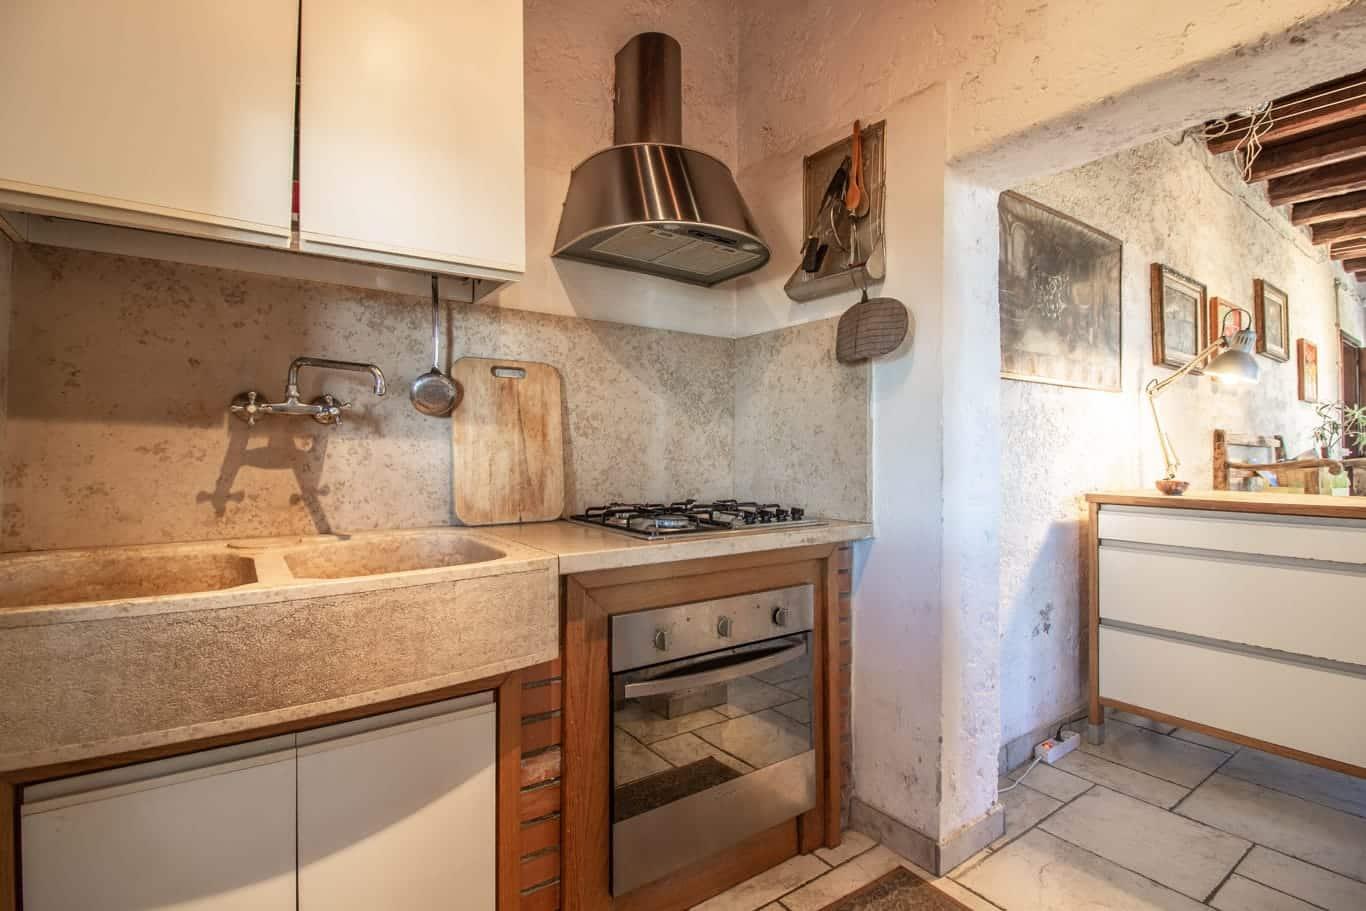 vendesi CASA SINGOLA CON GIARDINO a Teglio Veneto (5 of 6)